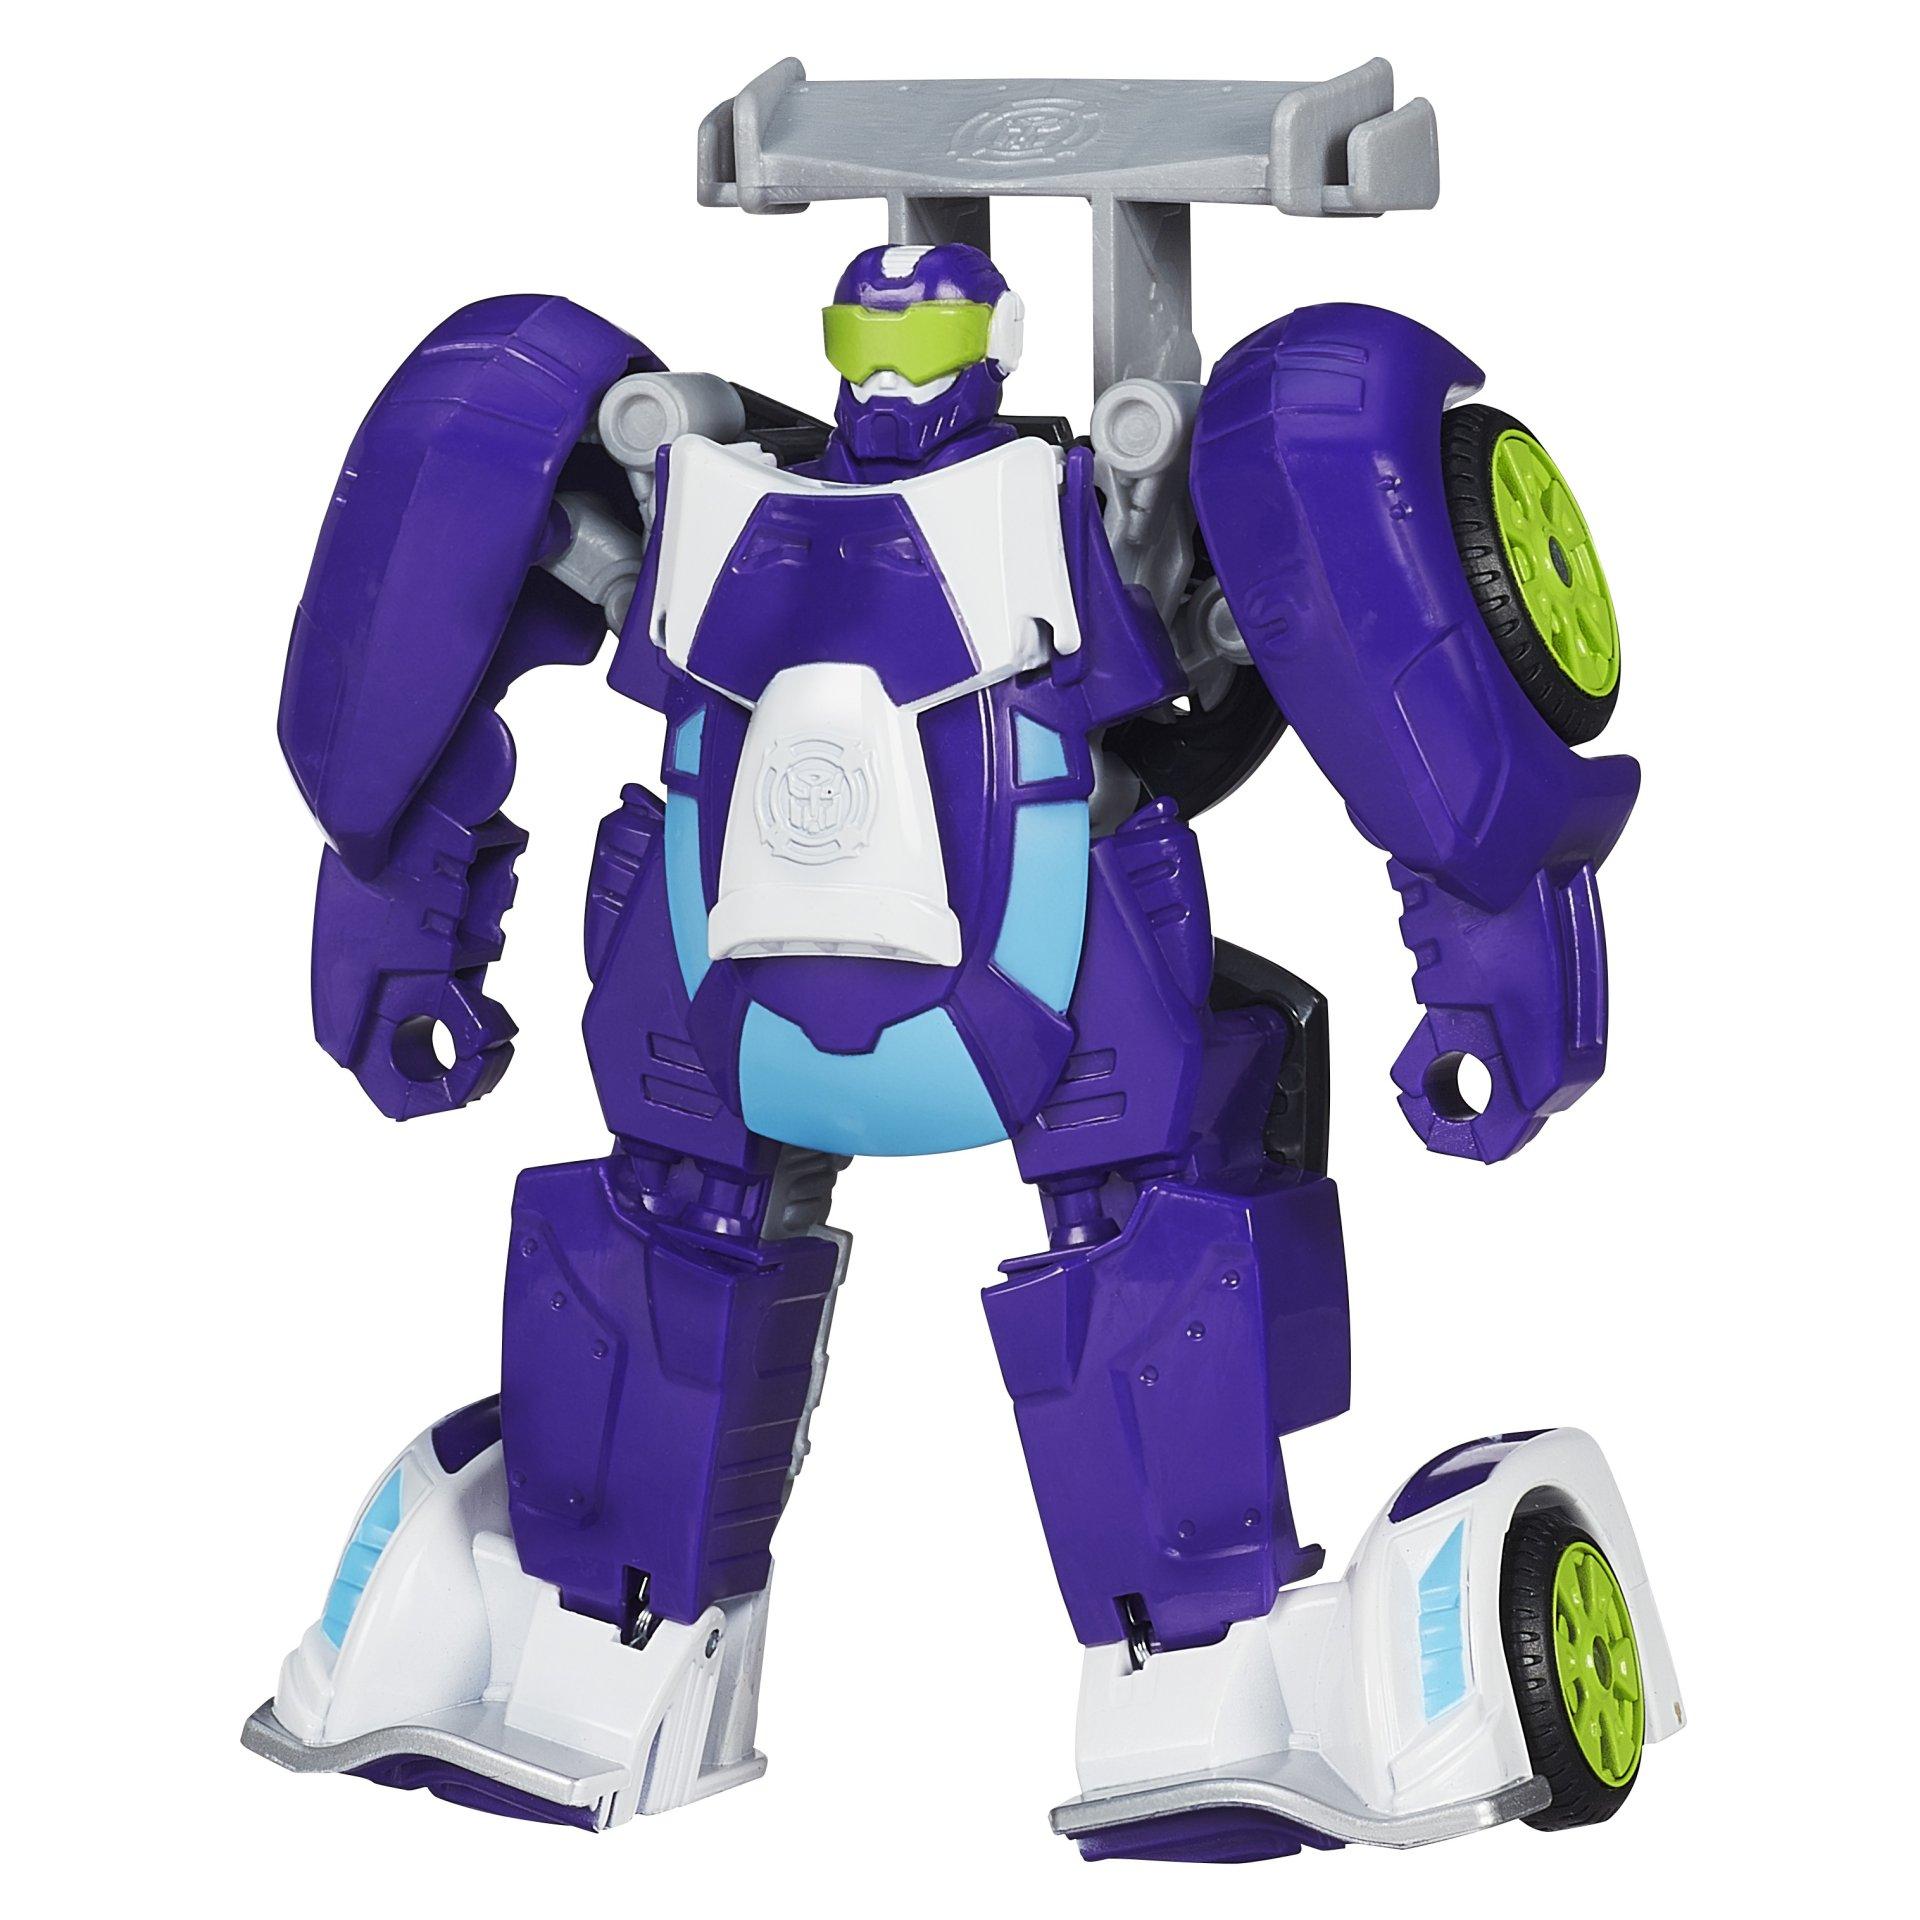 Rescuebots-Blurr_1427867557